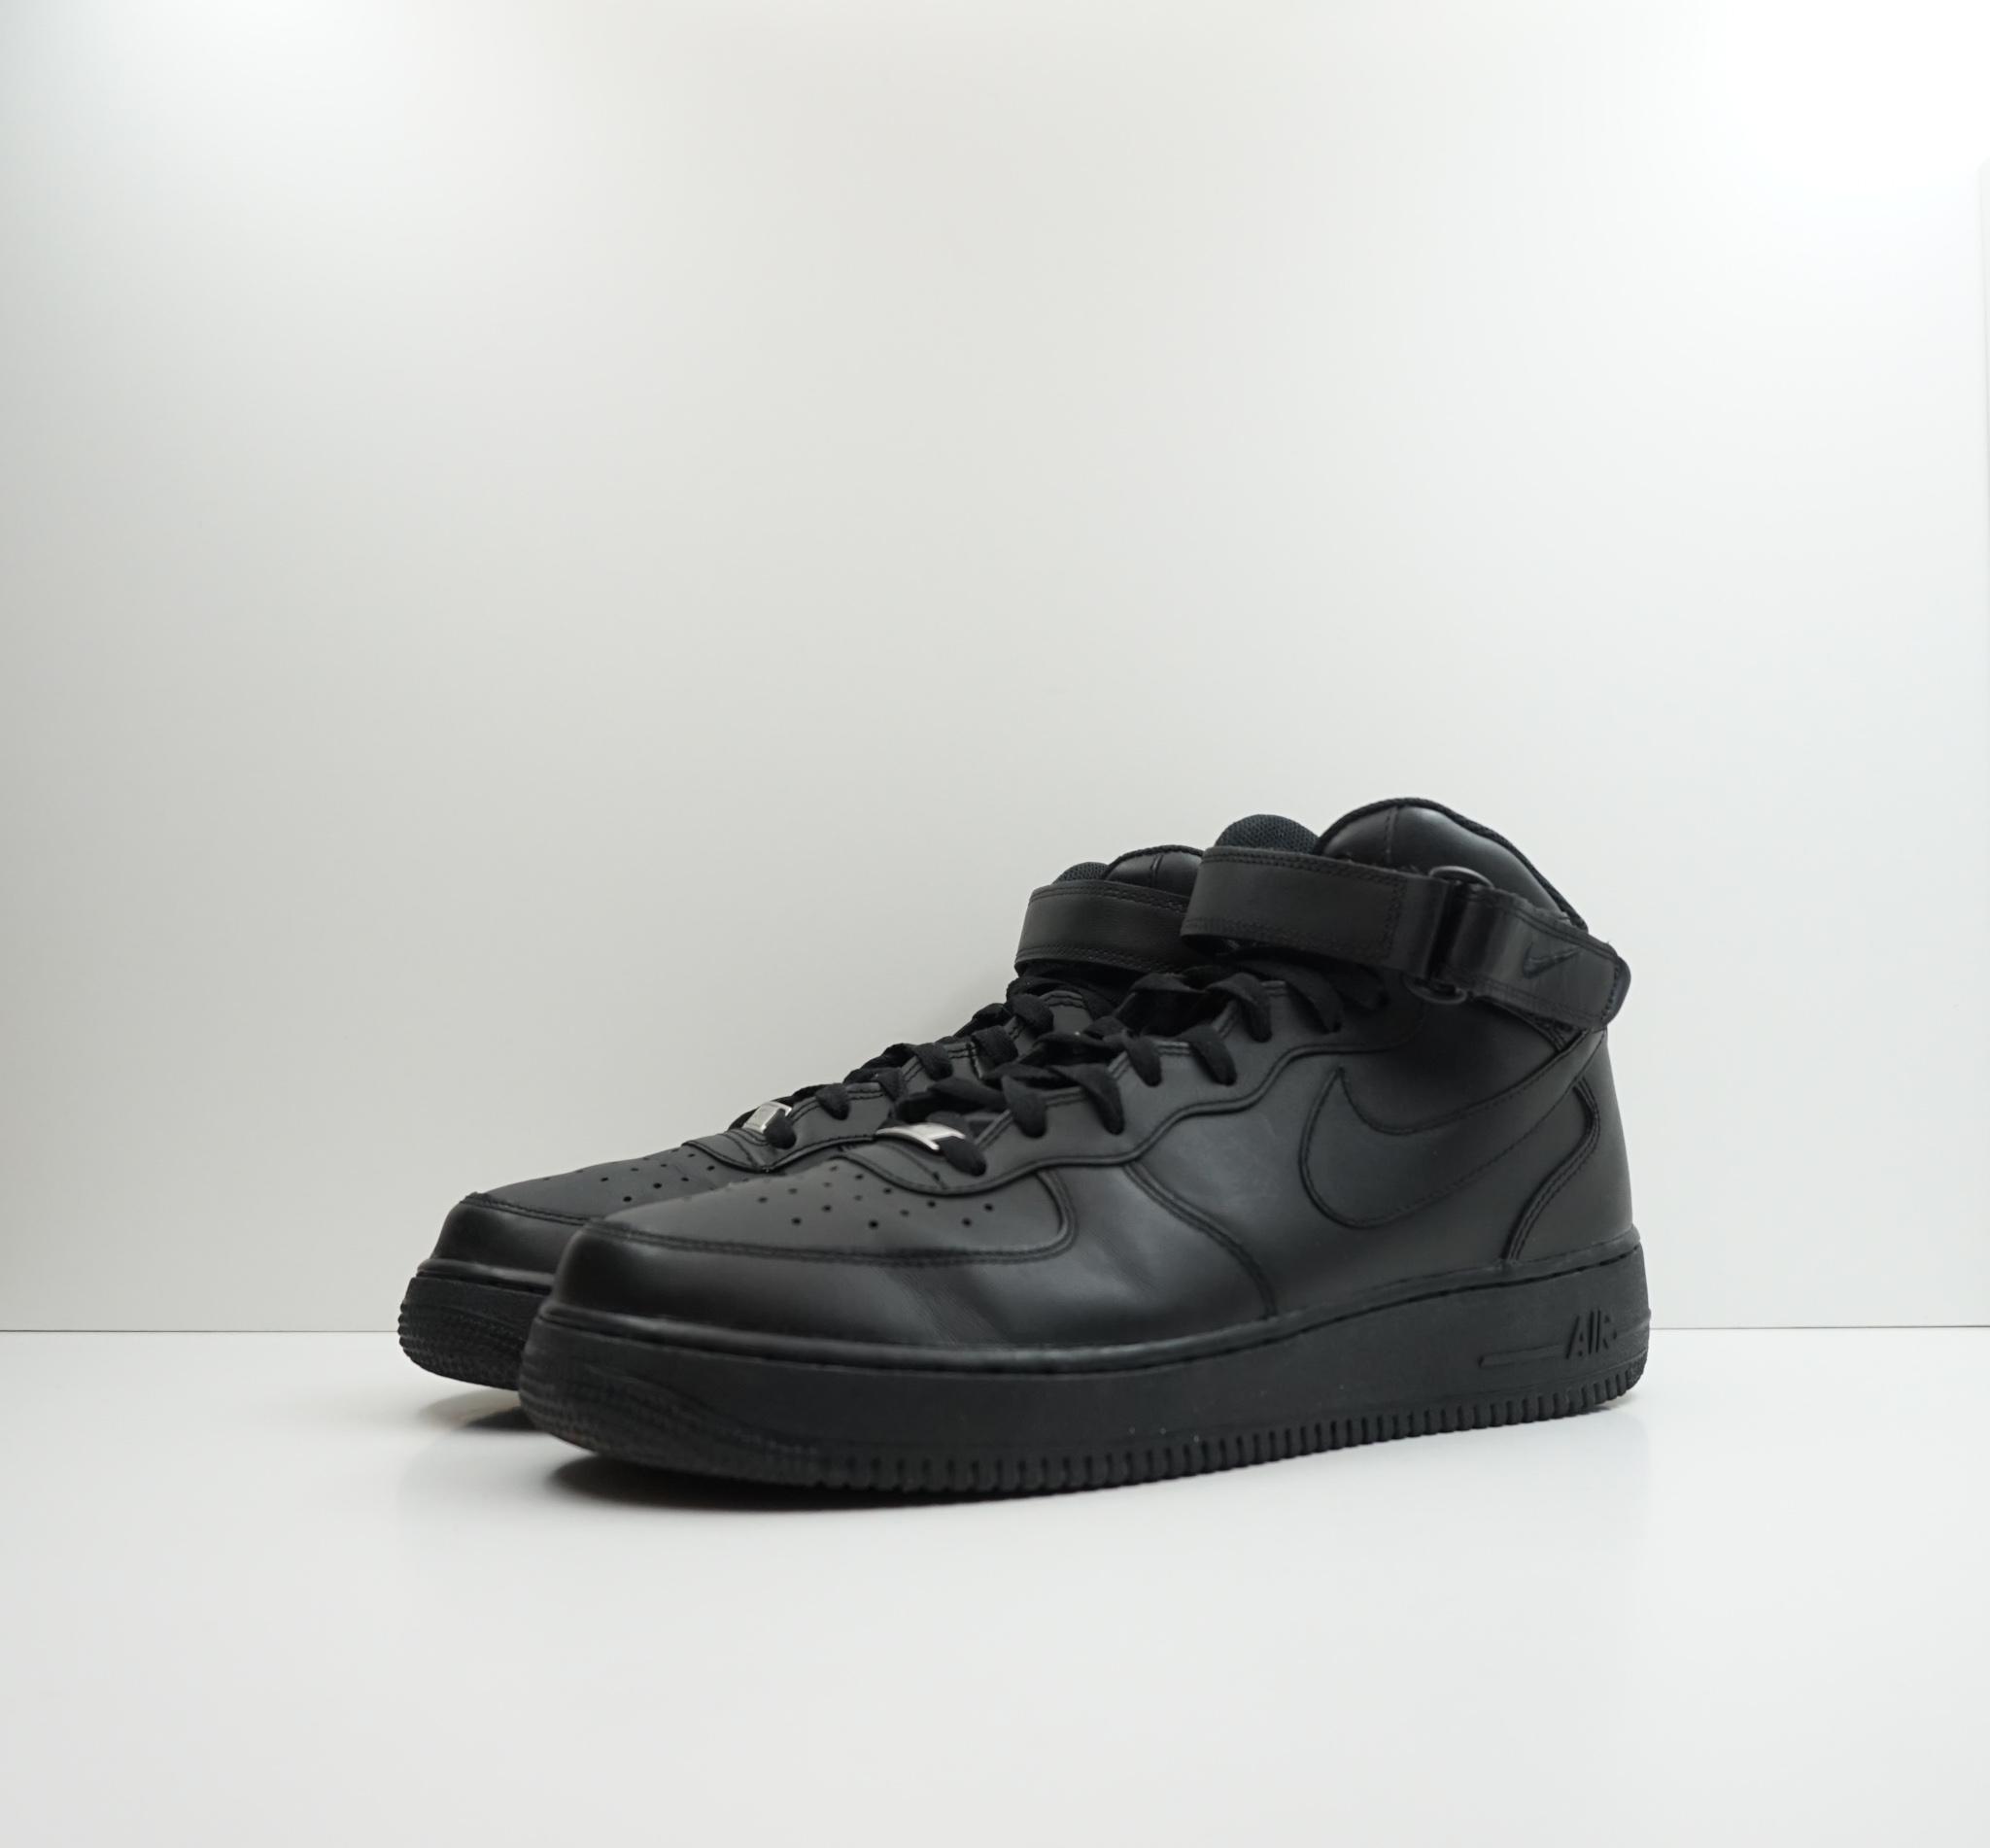 Nike Air Force 1 Mid Black (2016)